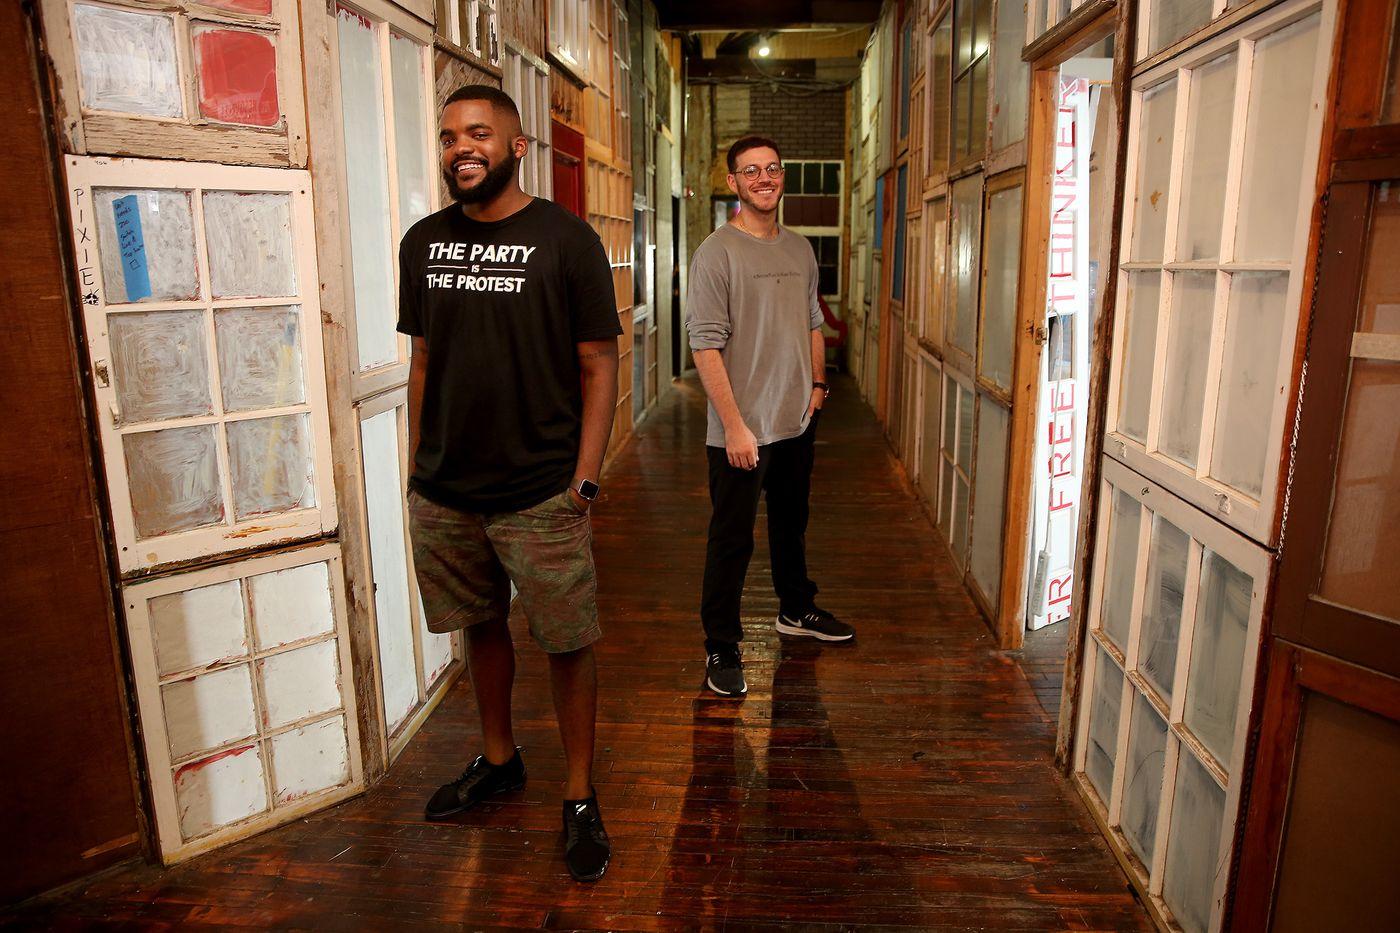 Photo credit: Philly.com ||  DAVID MAIALETTI